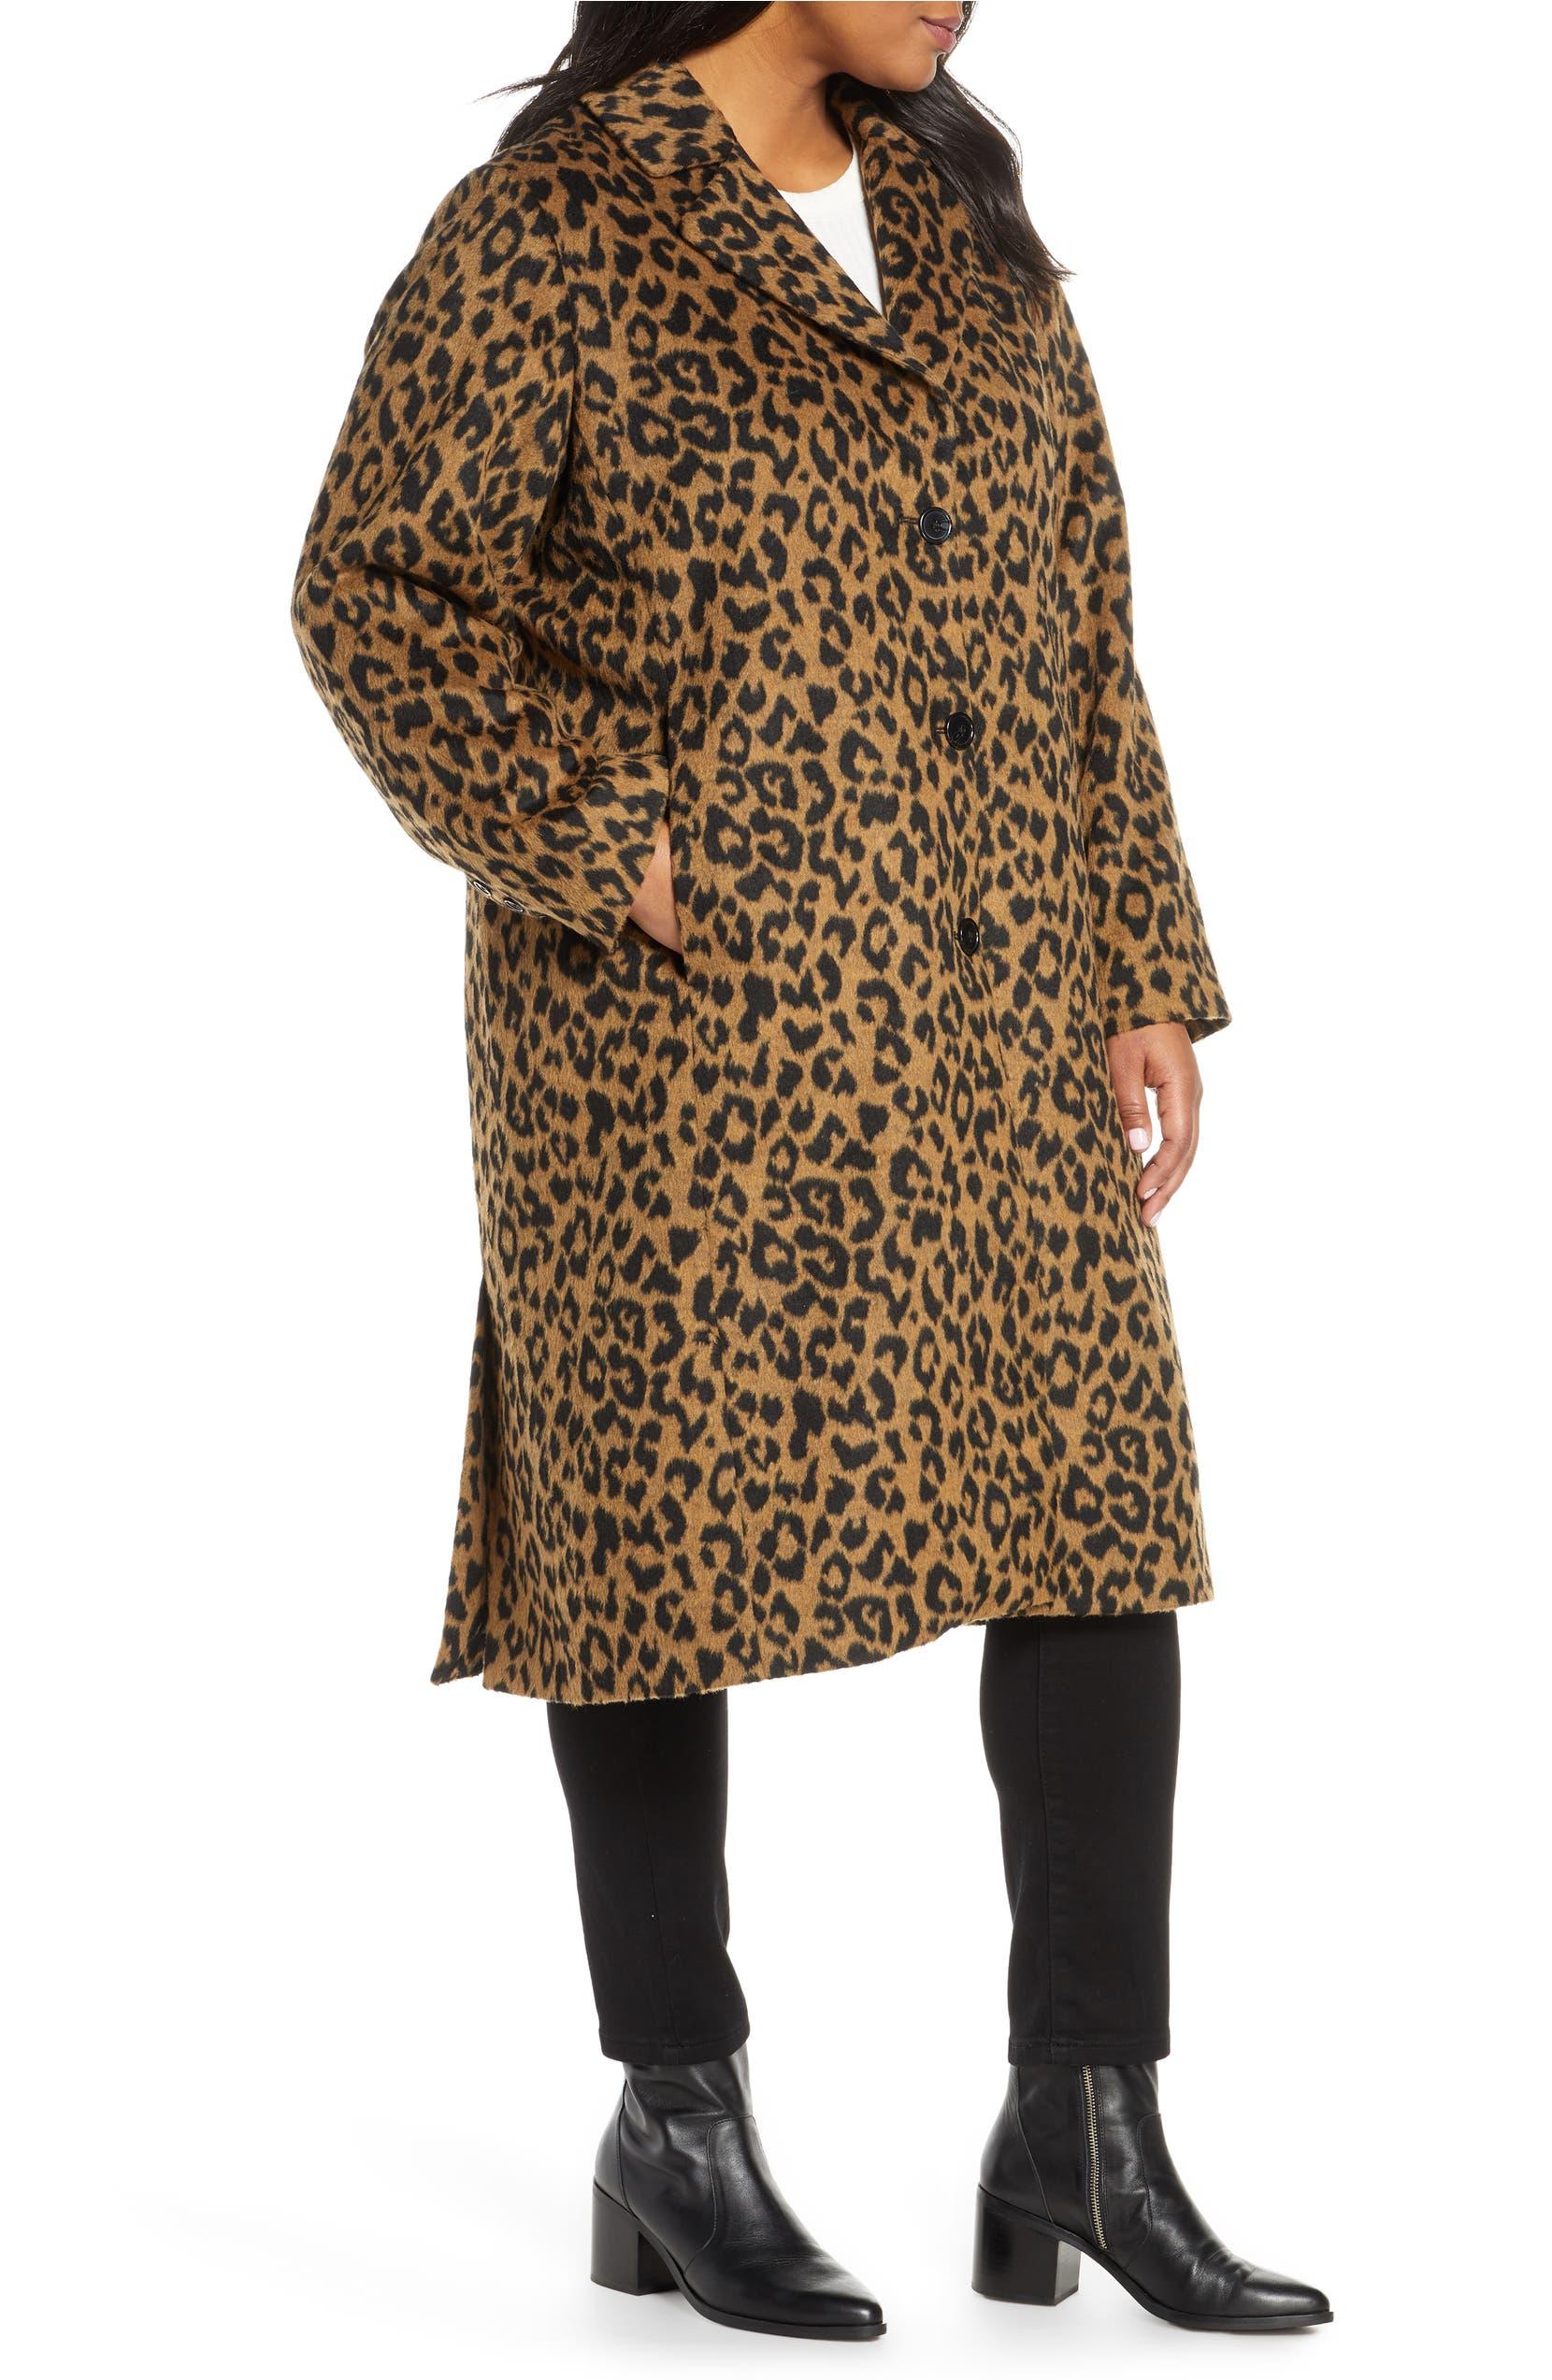 67c2c9a4aef1 Bernardo Leopard Print Coat (Plus Size)   Nordstrom